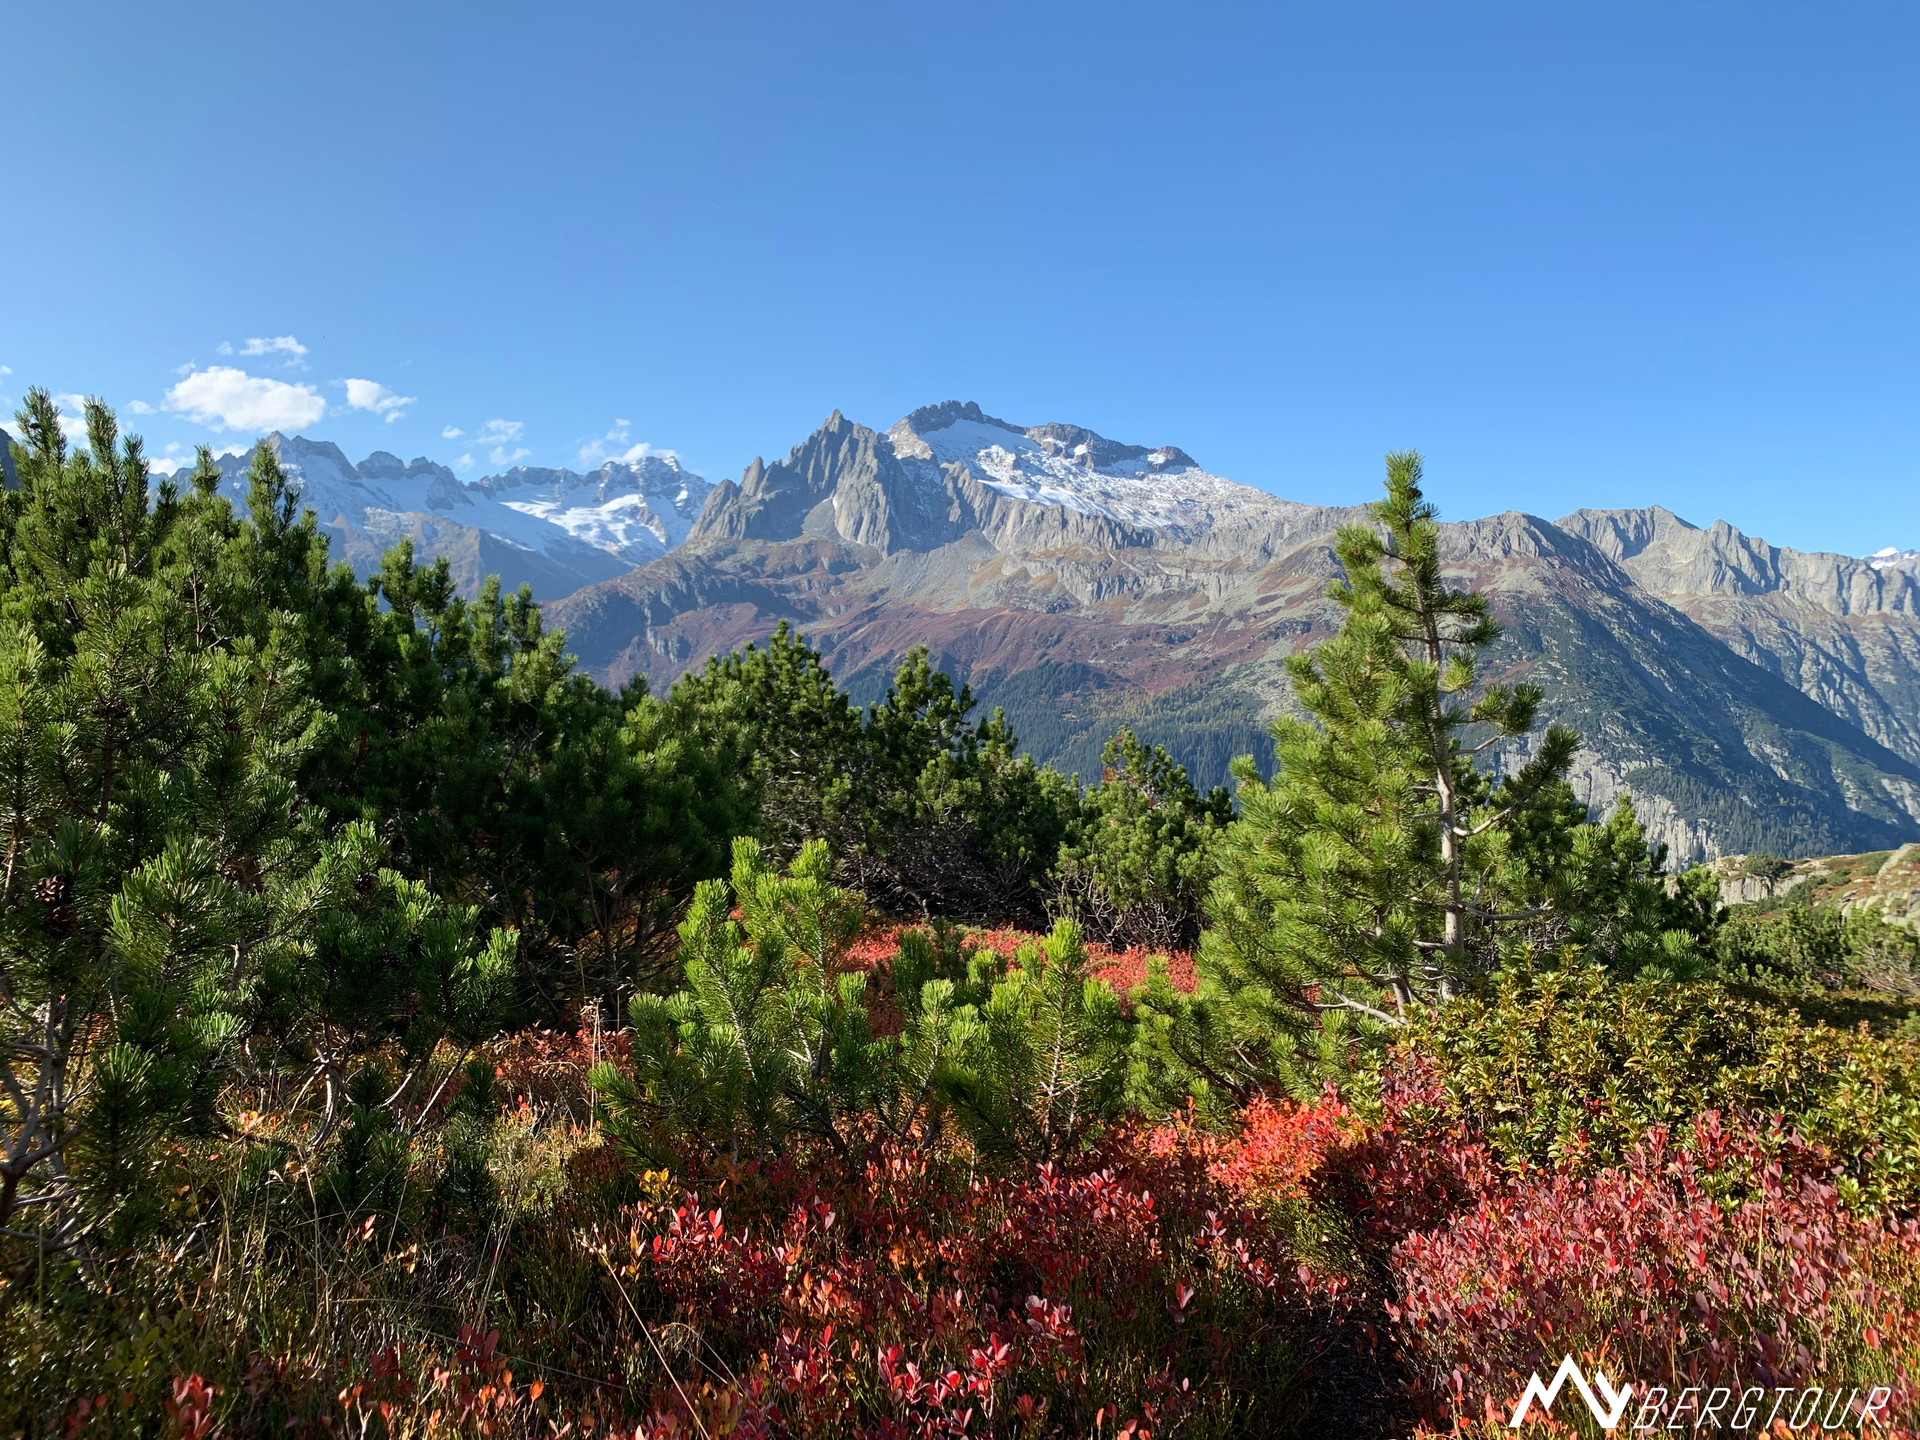 Teufelstalwand Klettern mybergtour Blick auf Salbit